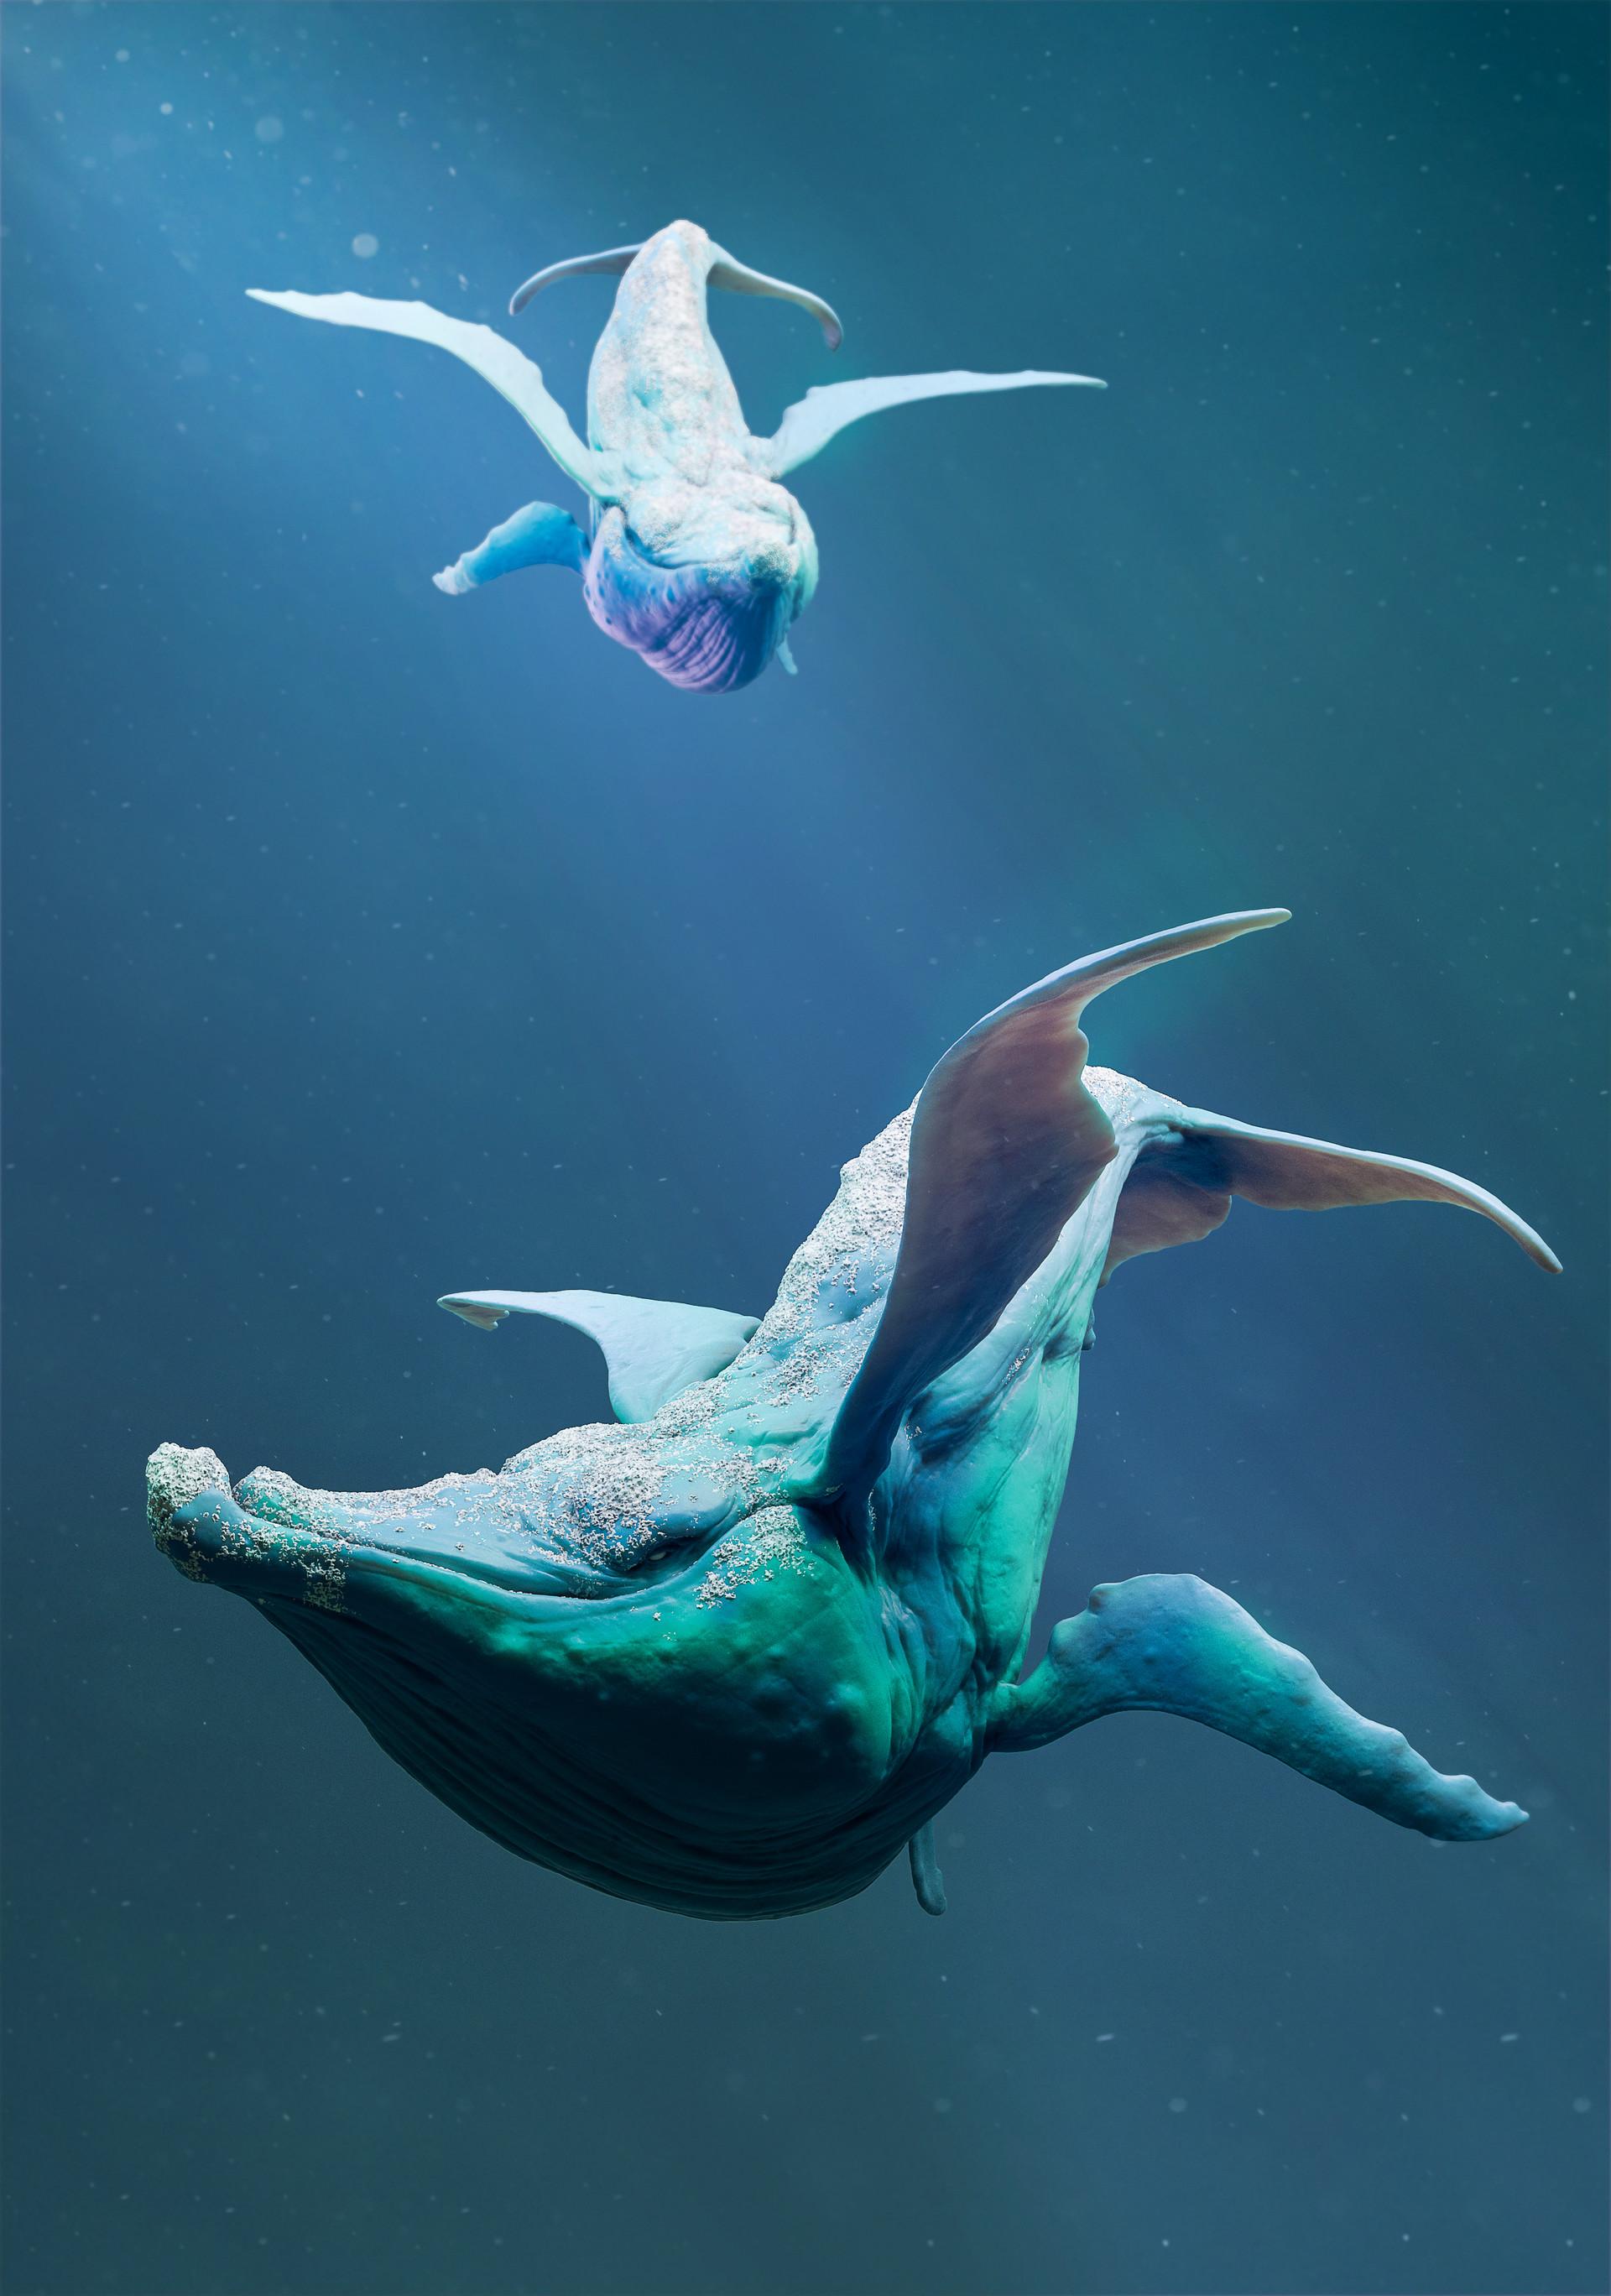 Mickael lelievre whale